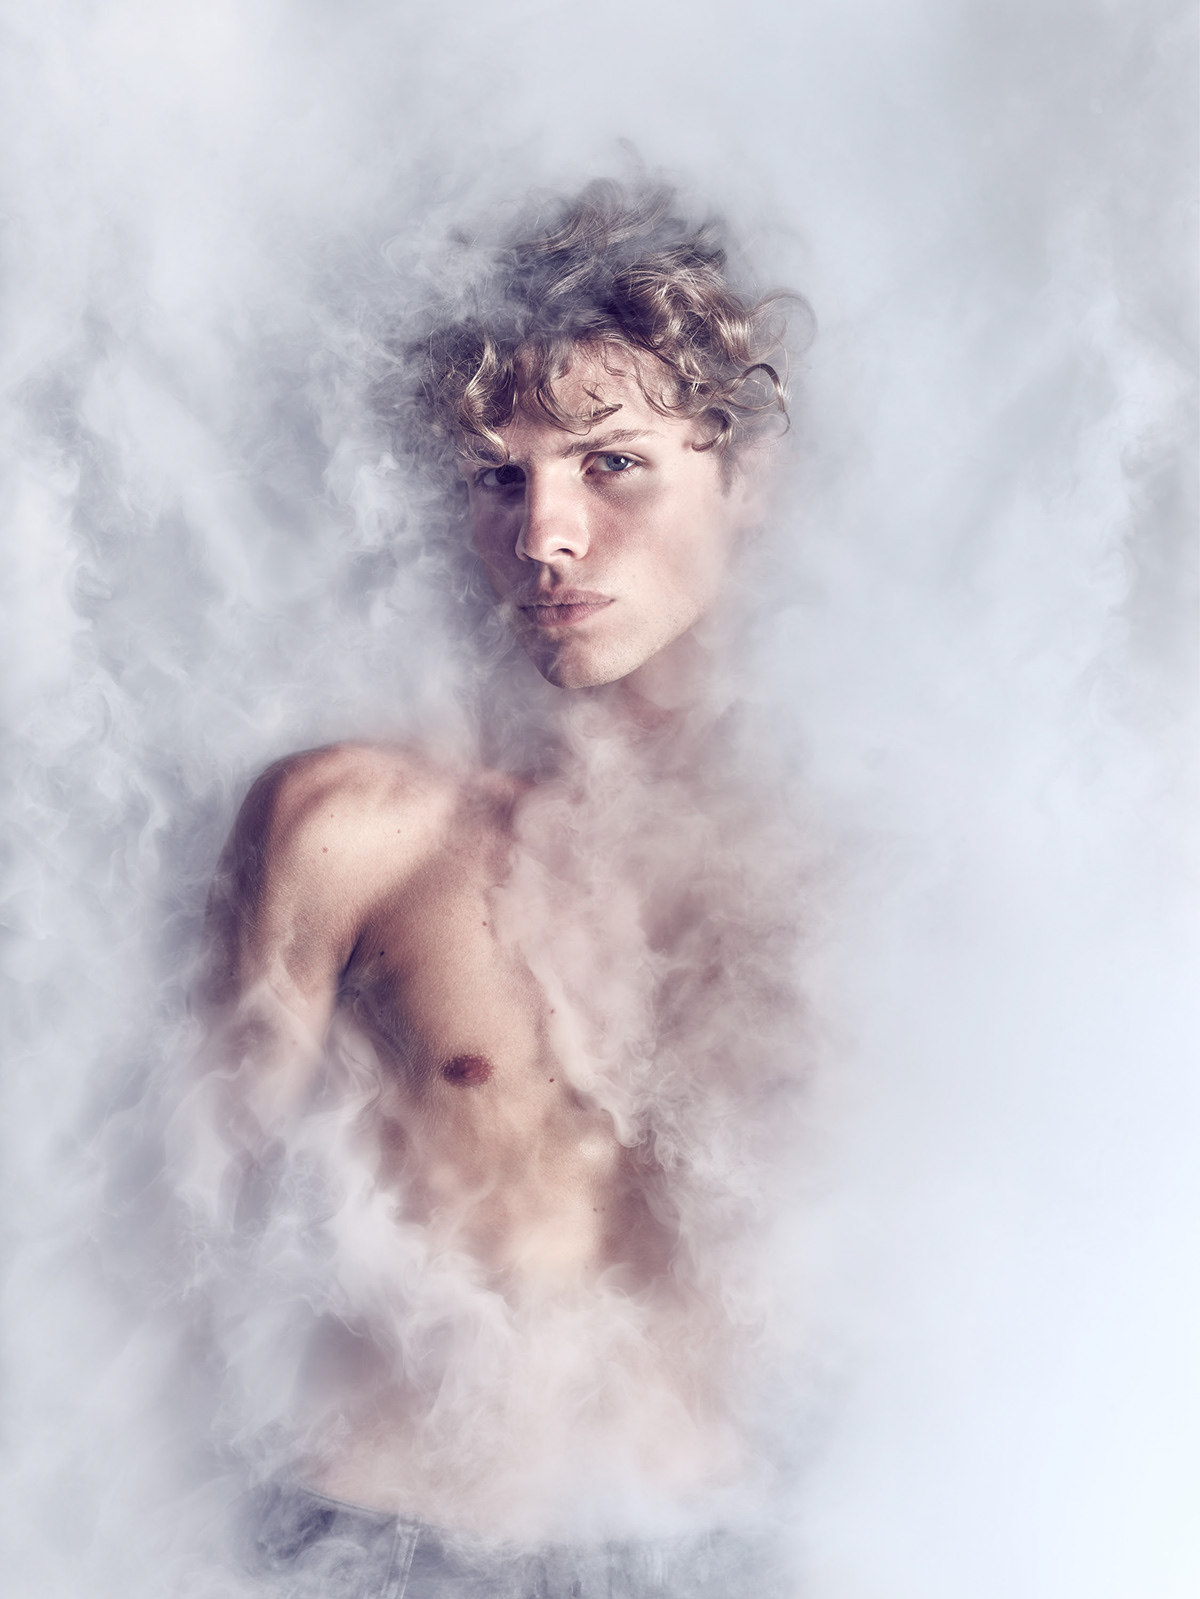 fog haze portrait Phase One IQ3 broncolor lyrical Melancholic modern